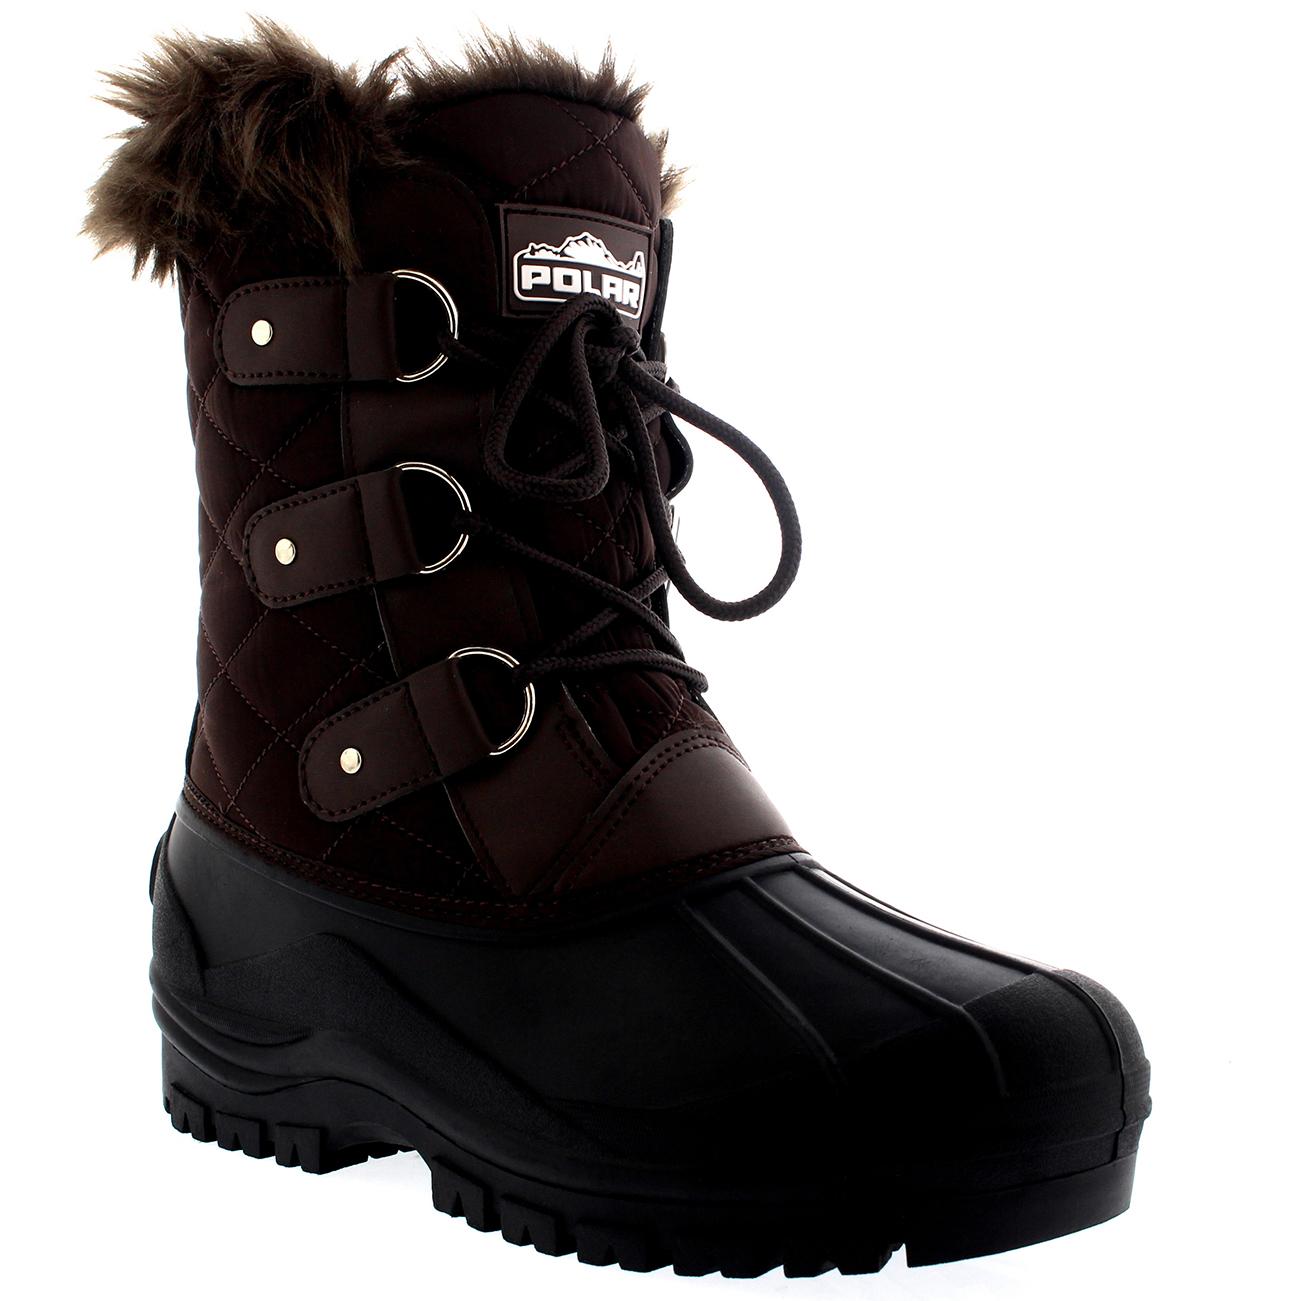 Womens Mid Calf Mountain Fur Lined Walking Tactical Waterproof Boots ... 716bdda29